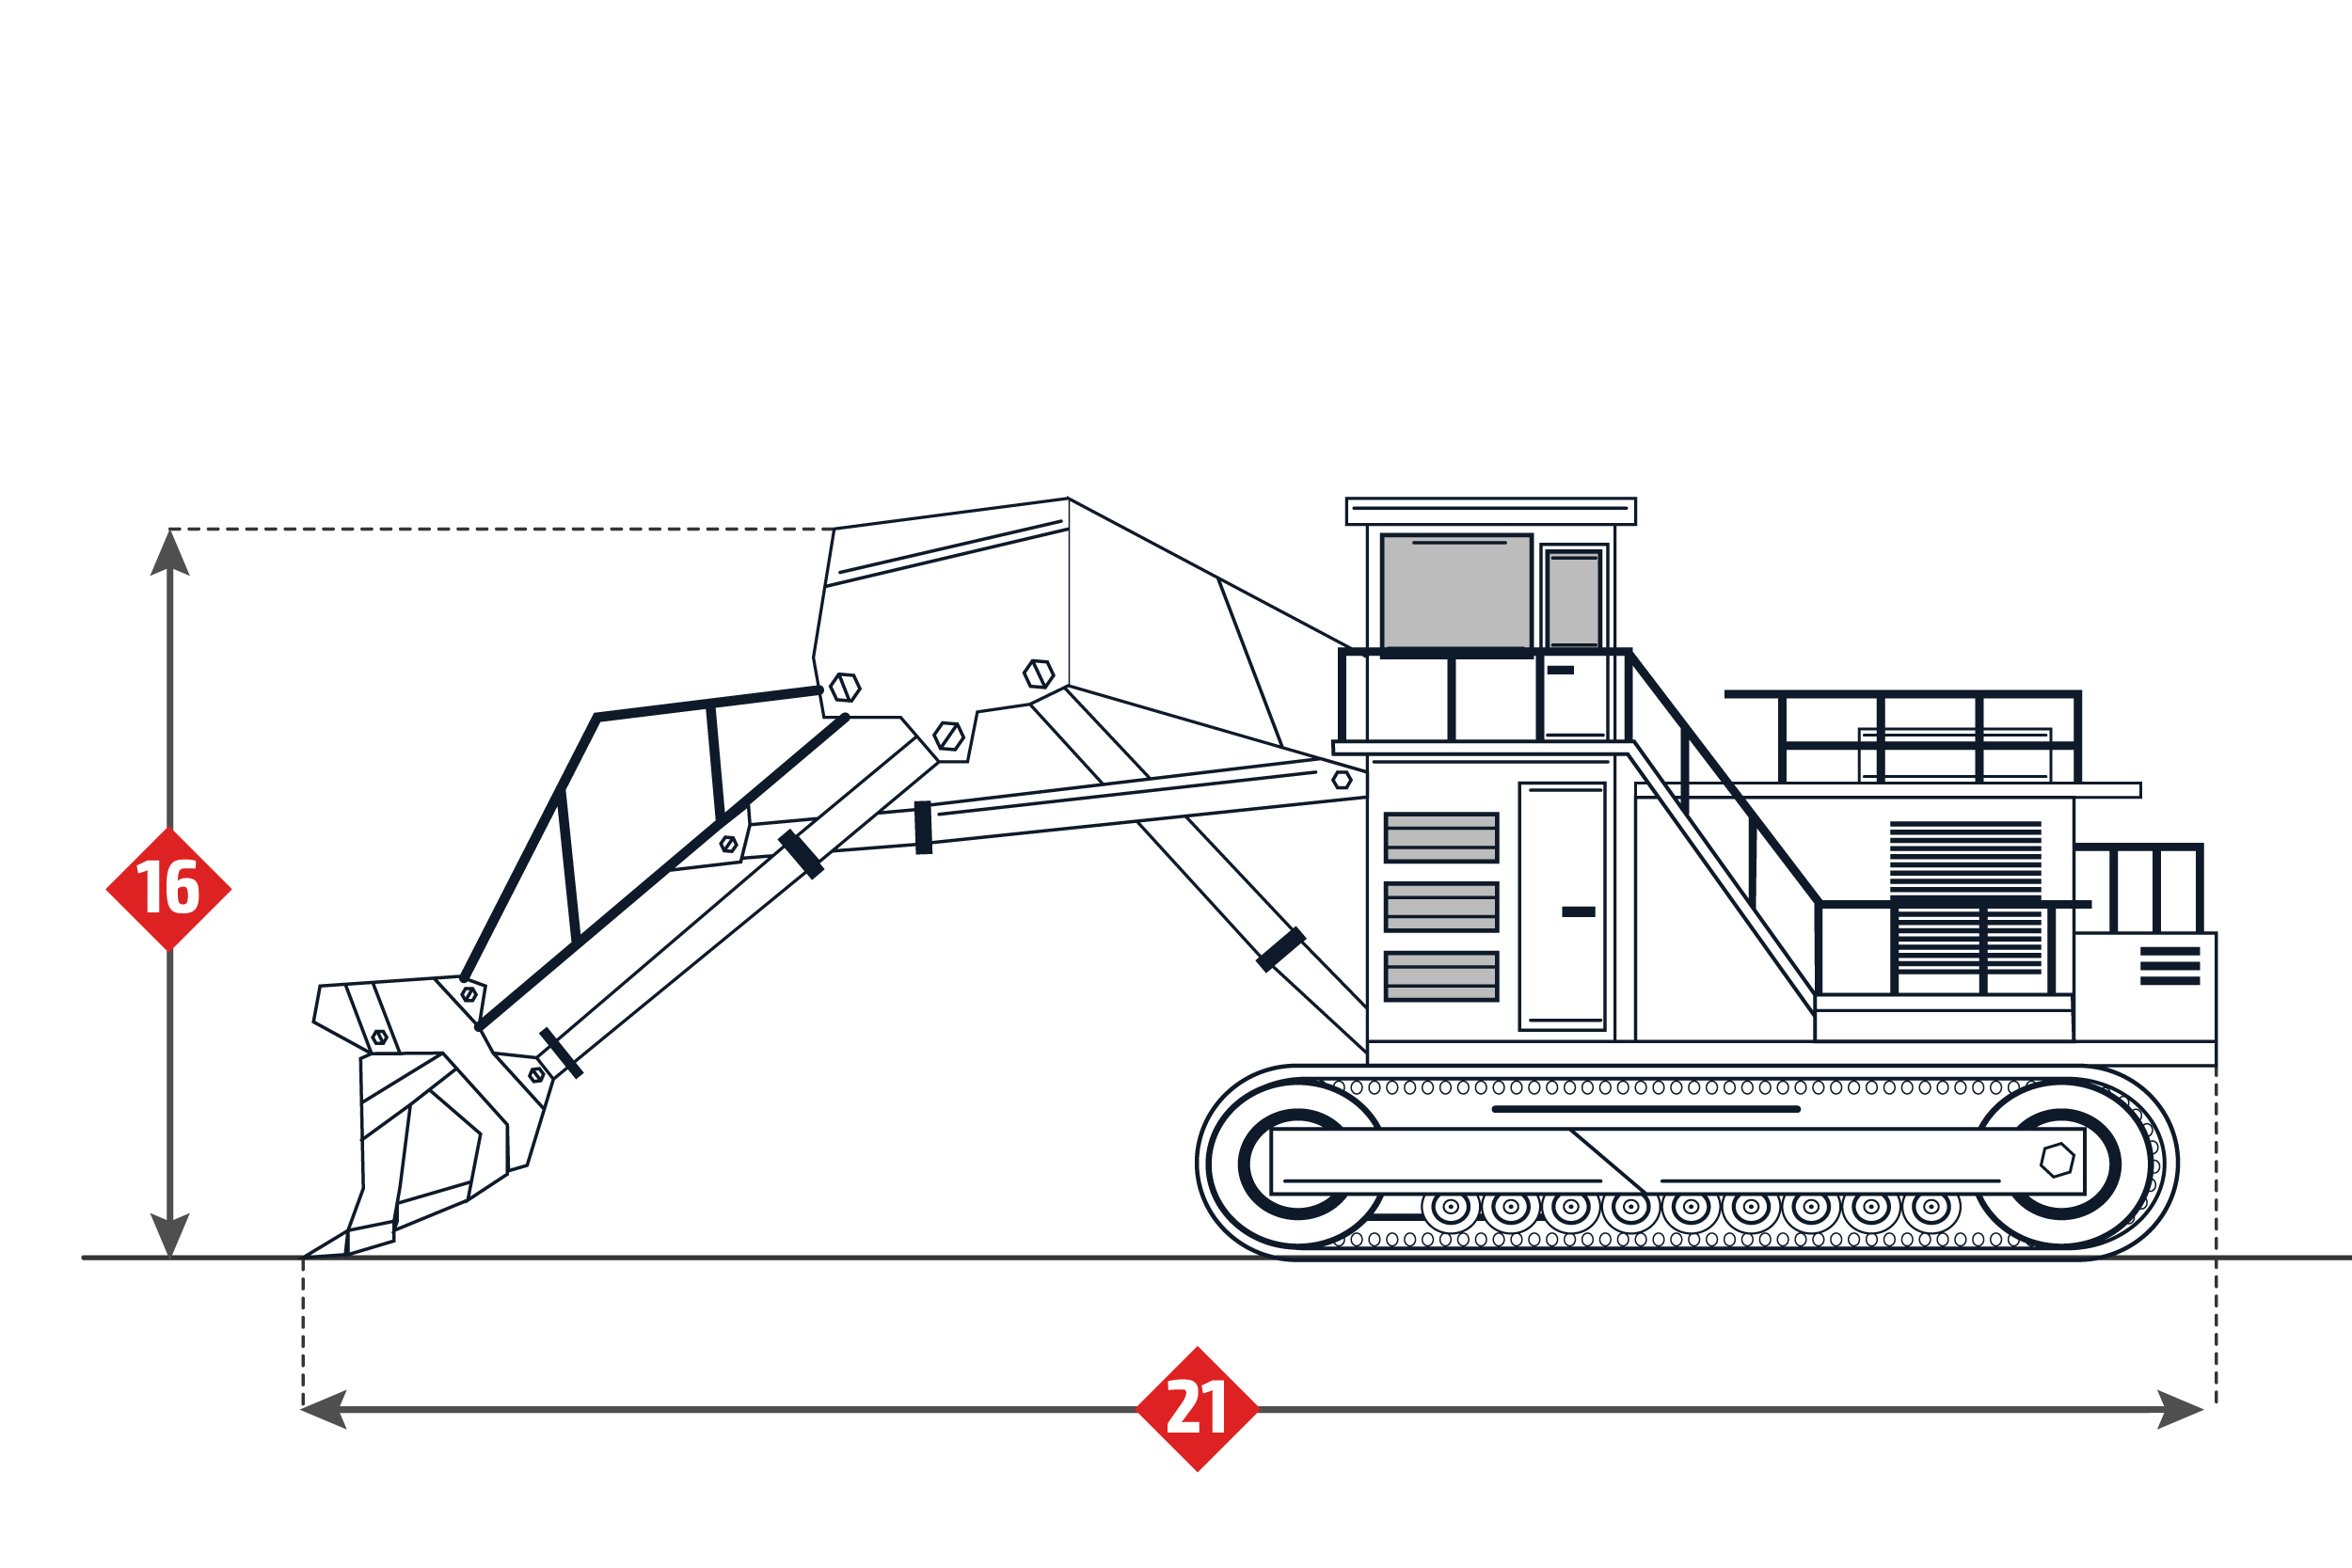 Terex Rh340 Specifications Mining Excavator